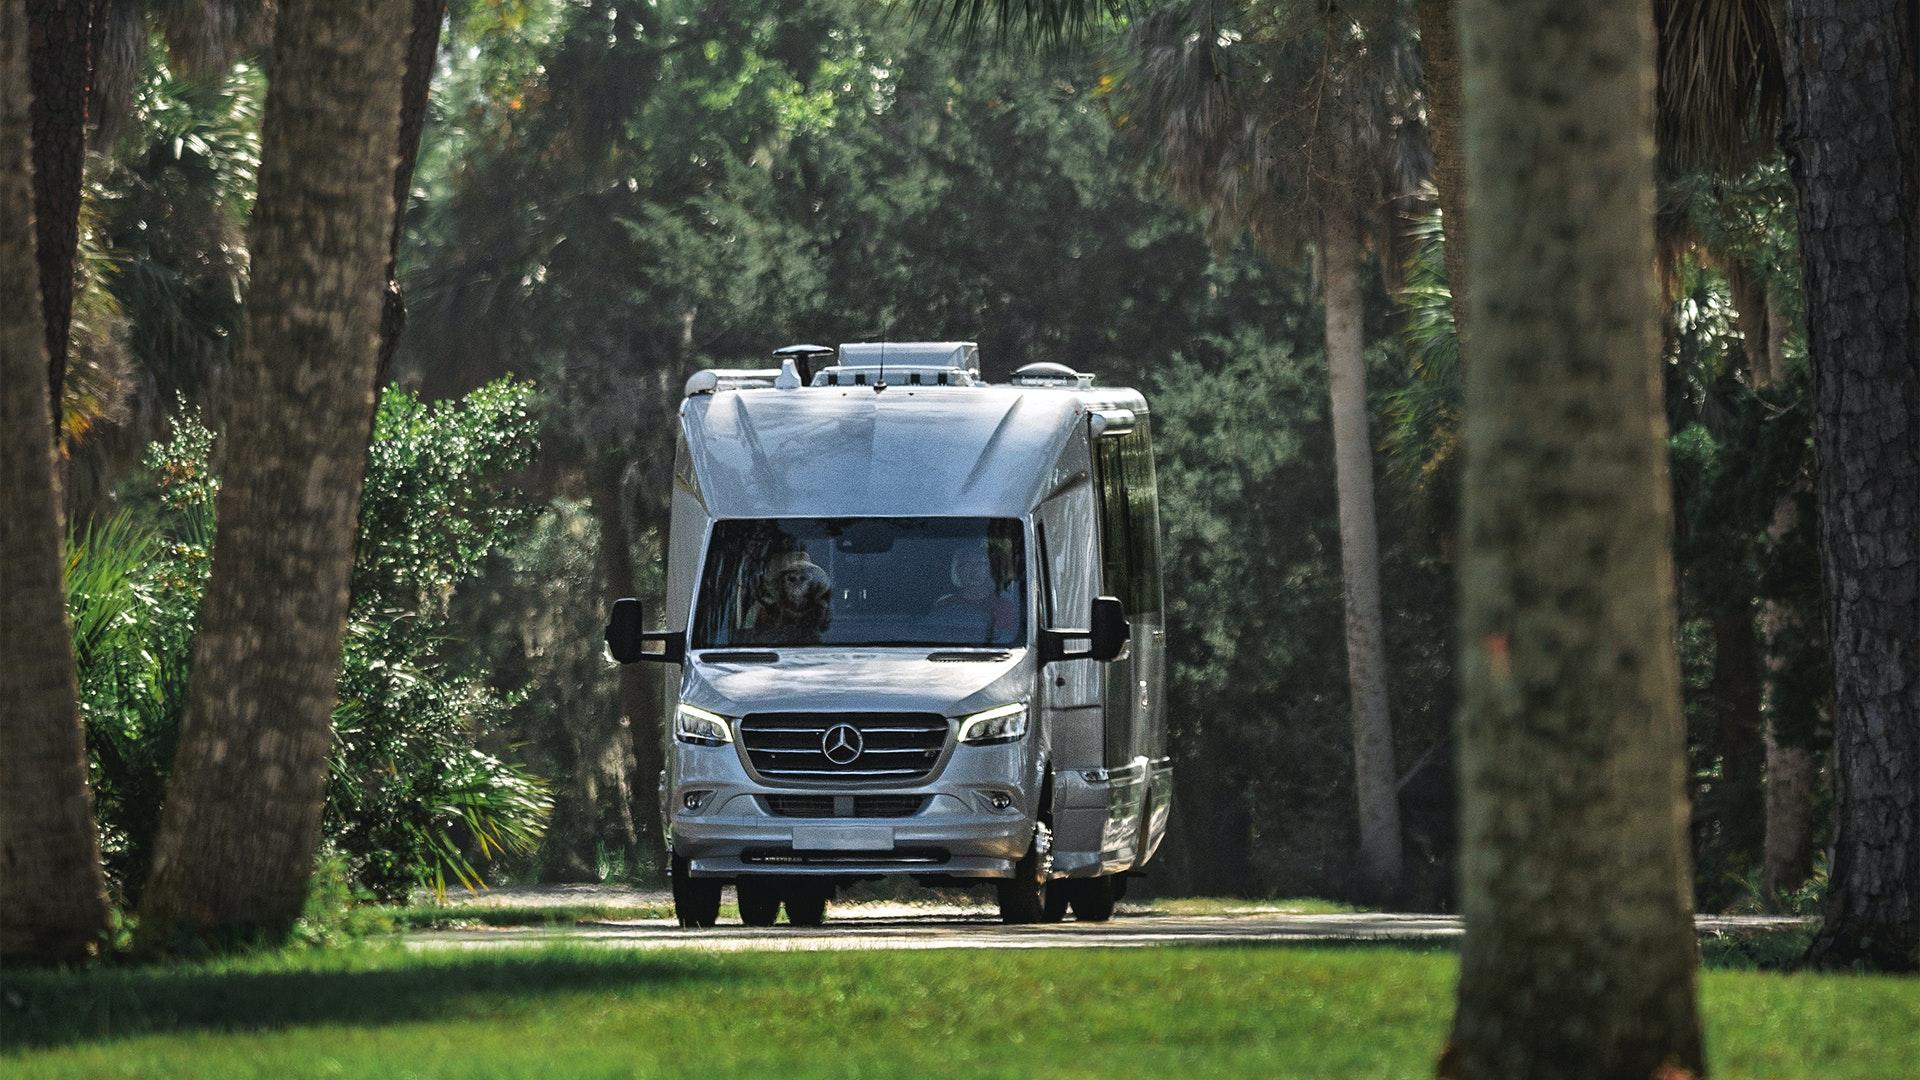 Airstream-Atlas-Mercedes-Benz-Luxury-RV-Coach